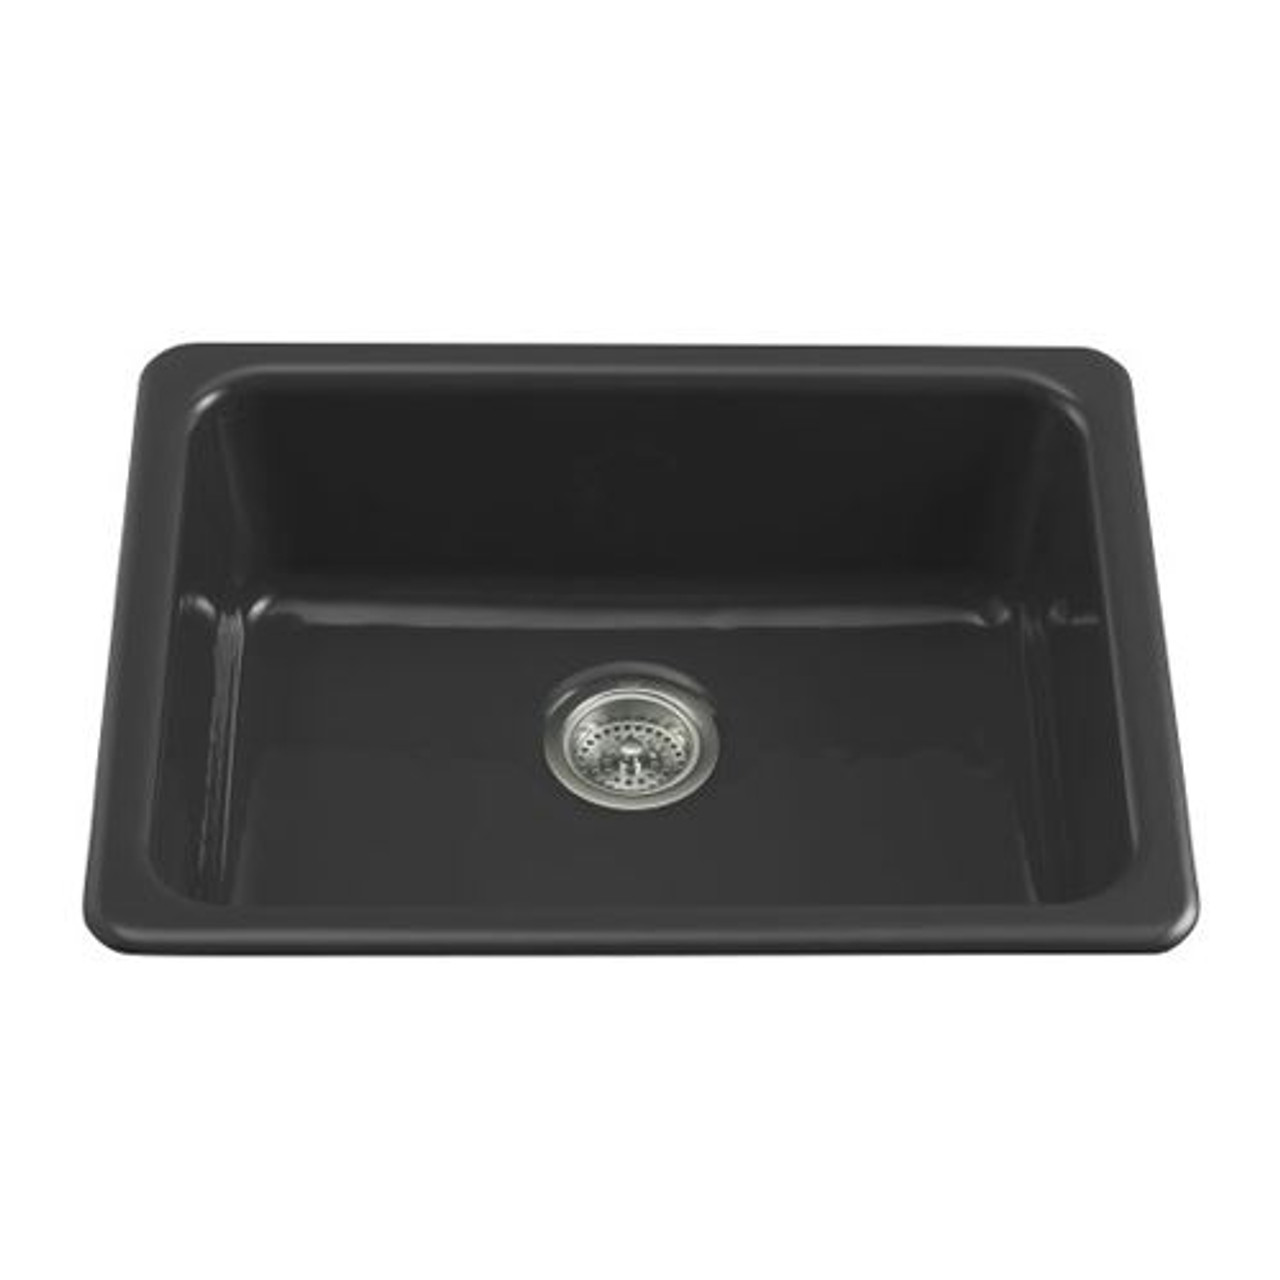 Kohler Iron Tones Large Bowl Kitchen Sink